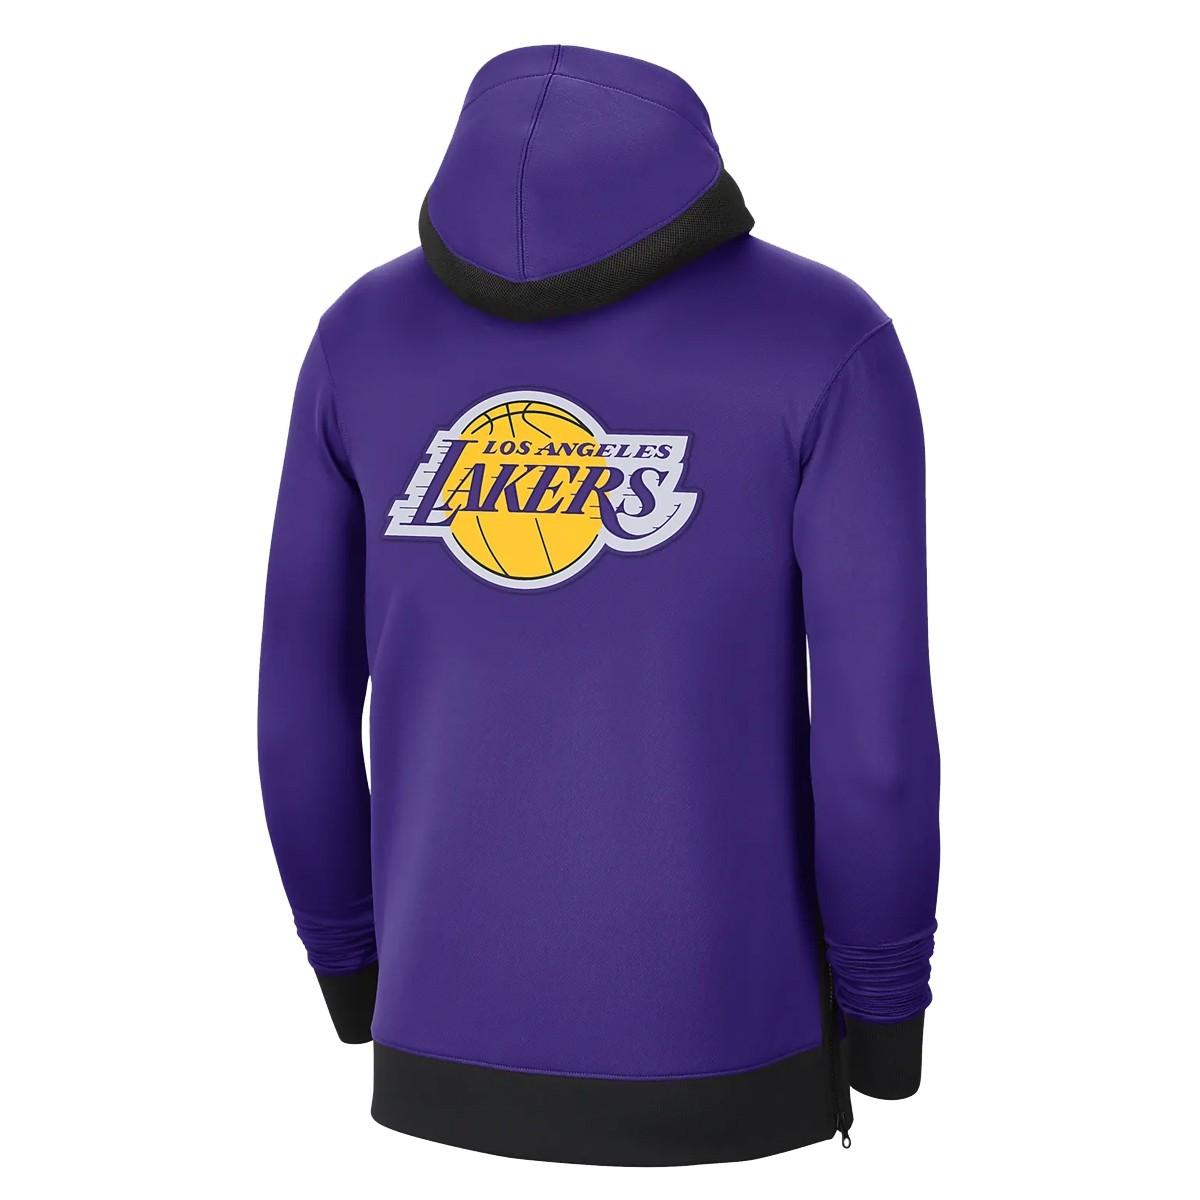 Nike Jr NBA Therma Flex Showtime 'Los Angeles Lakers'-EZ2B7FDBV-LAK